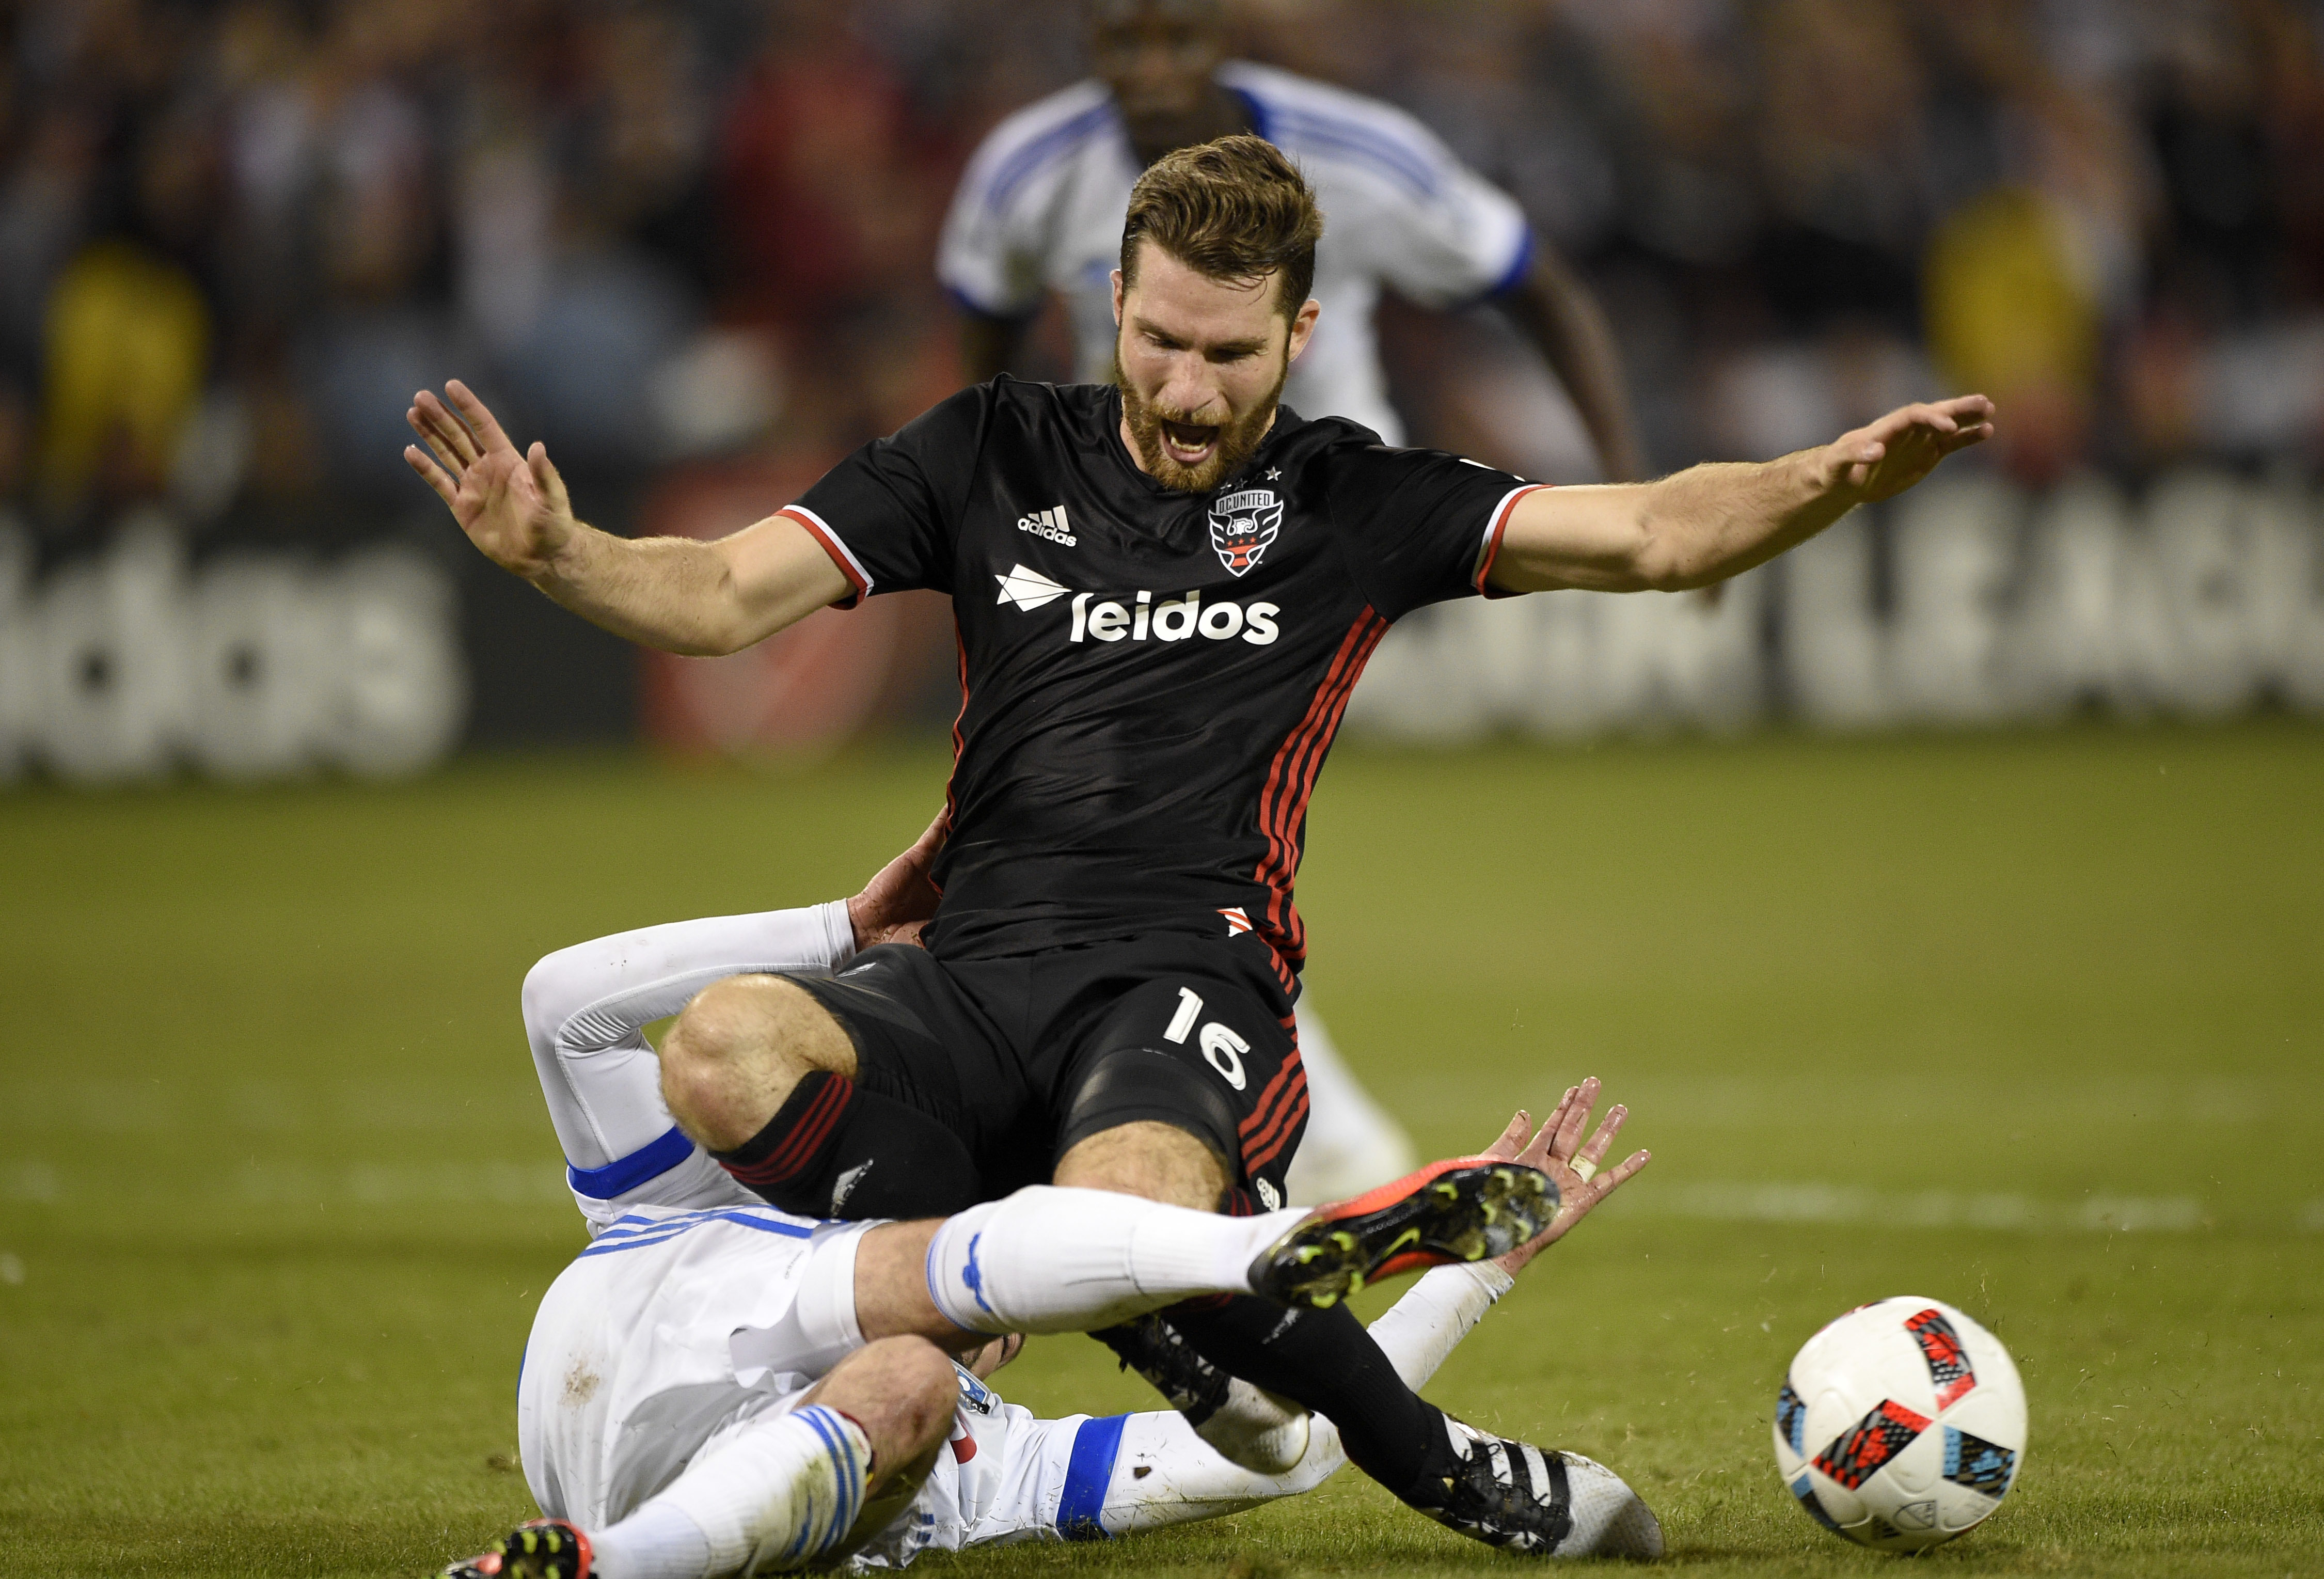 Mls_impact_united_soccer.jpeg-26961